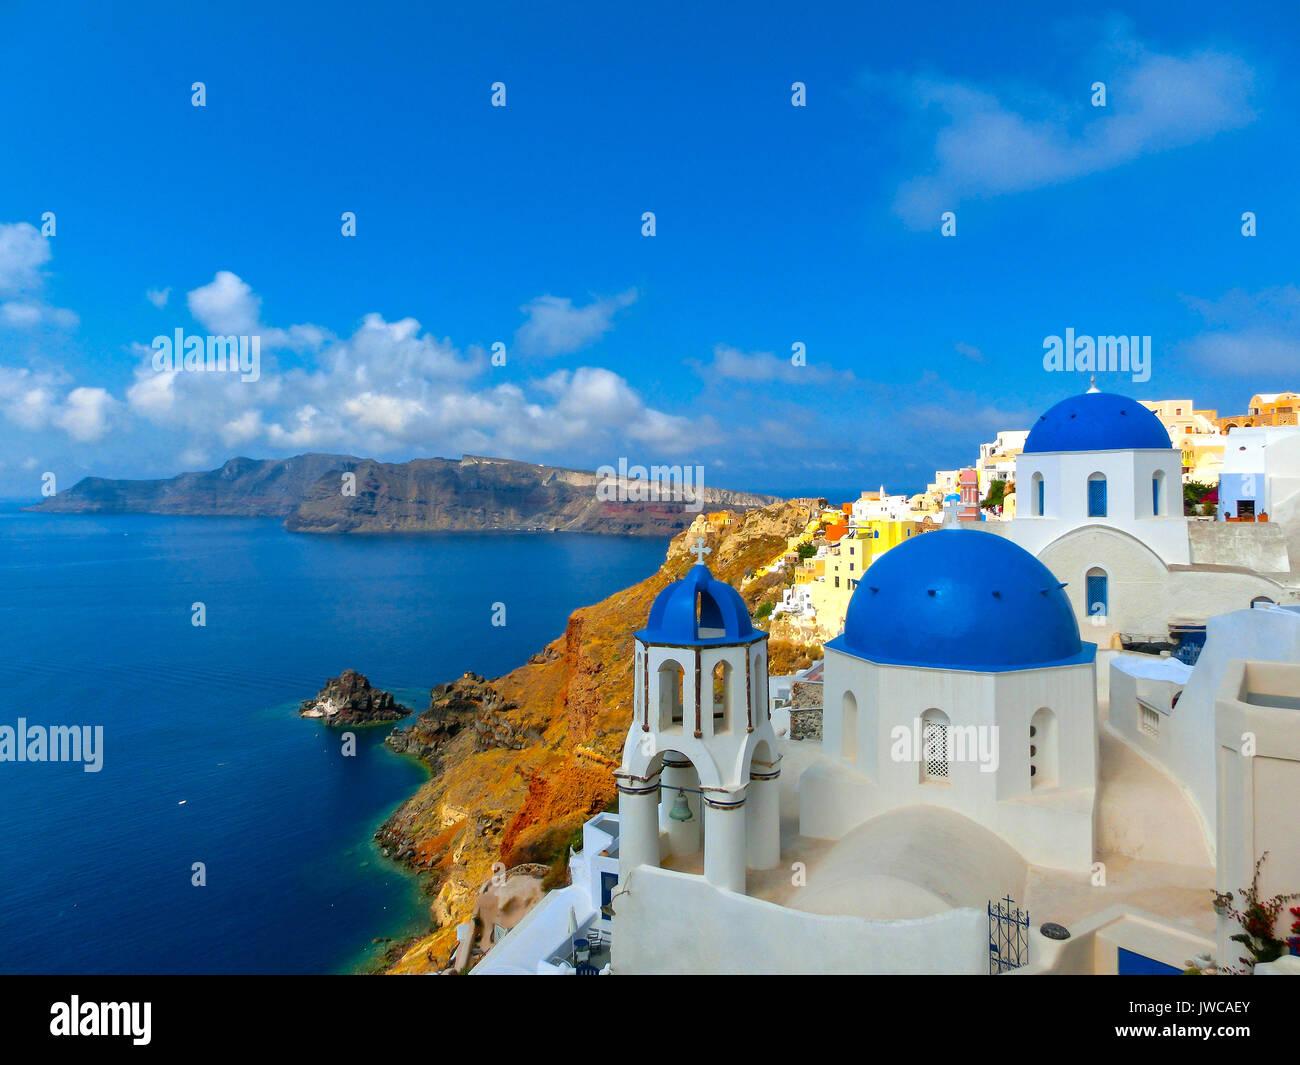 Blick auf das Meer vom Dorf Oia Santorini Insel in Griechenland Stockbild